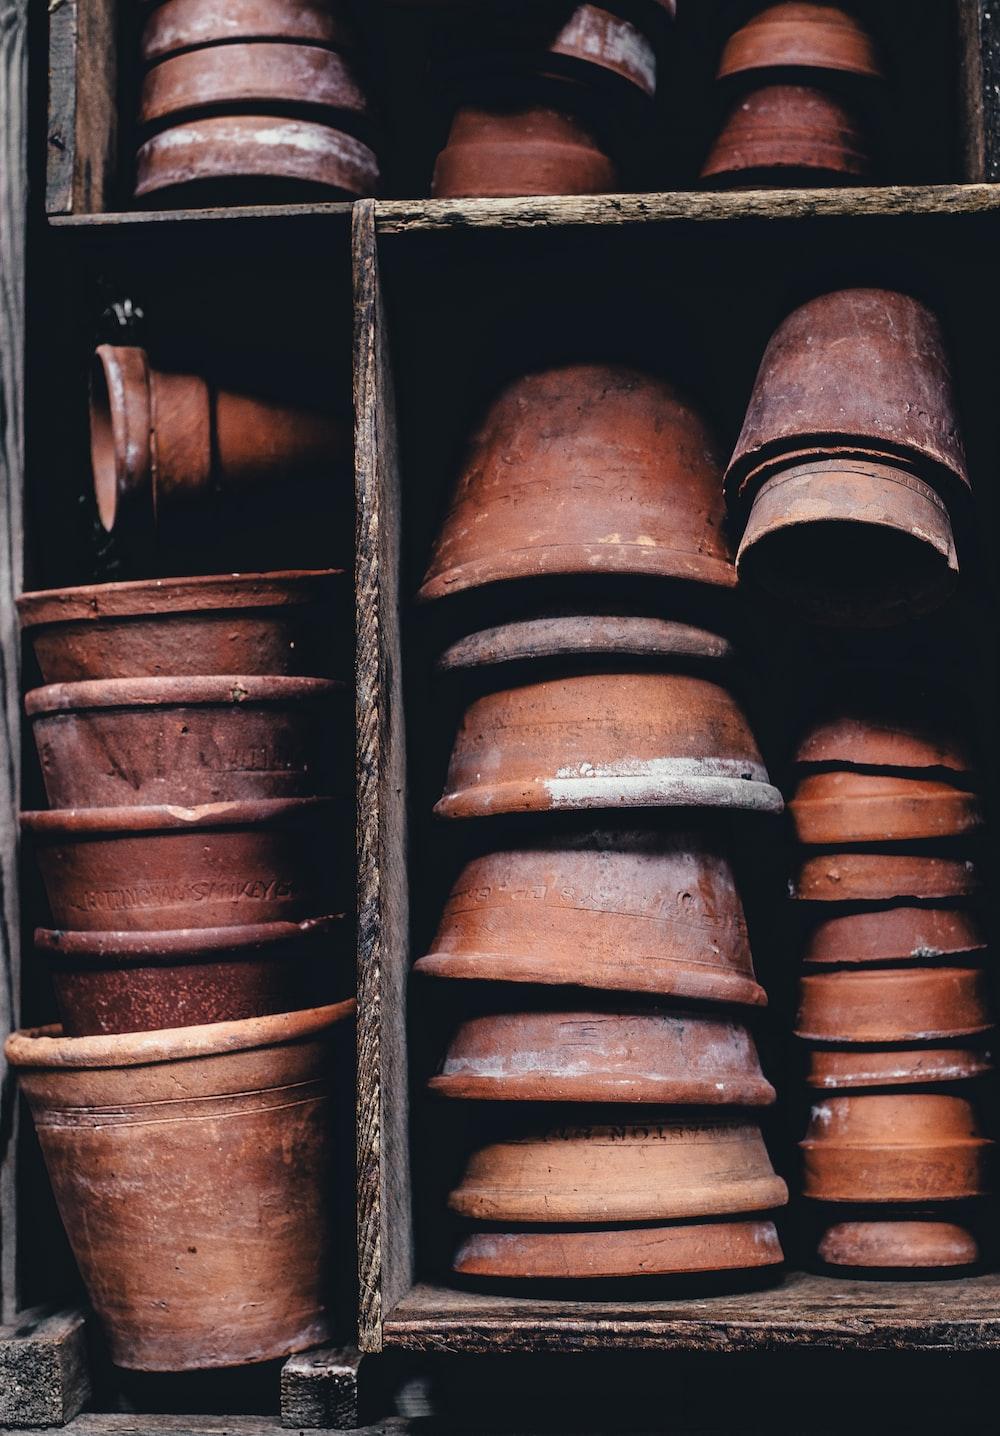 closeup photo of stack of brown clay pot lot